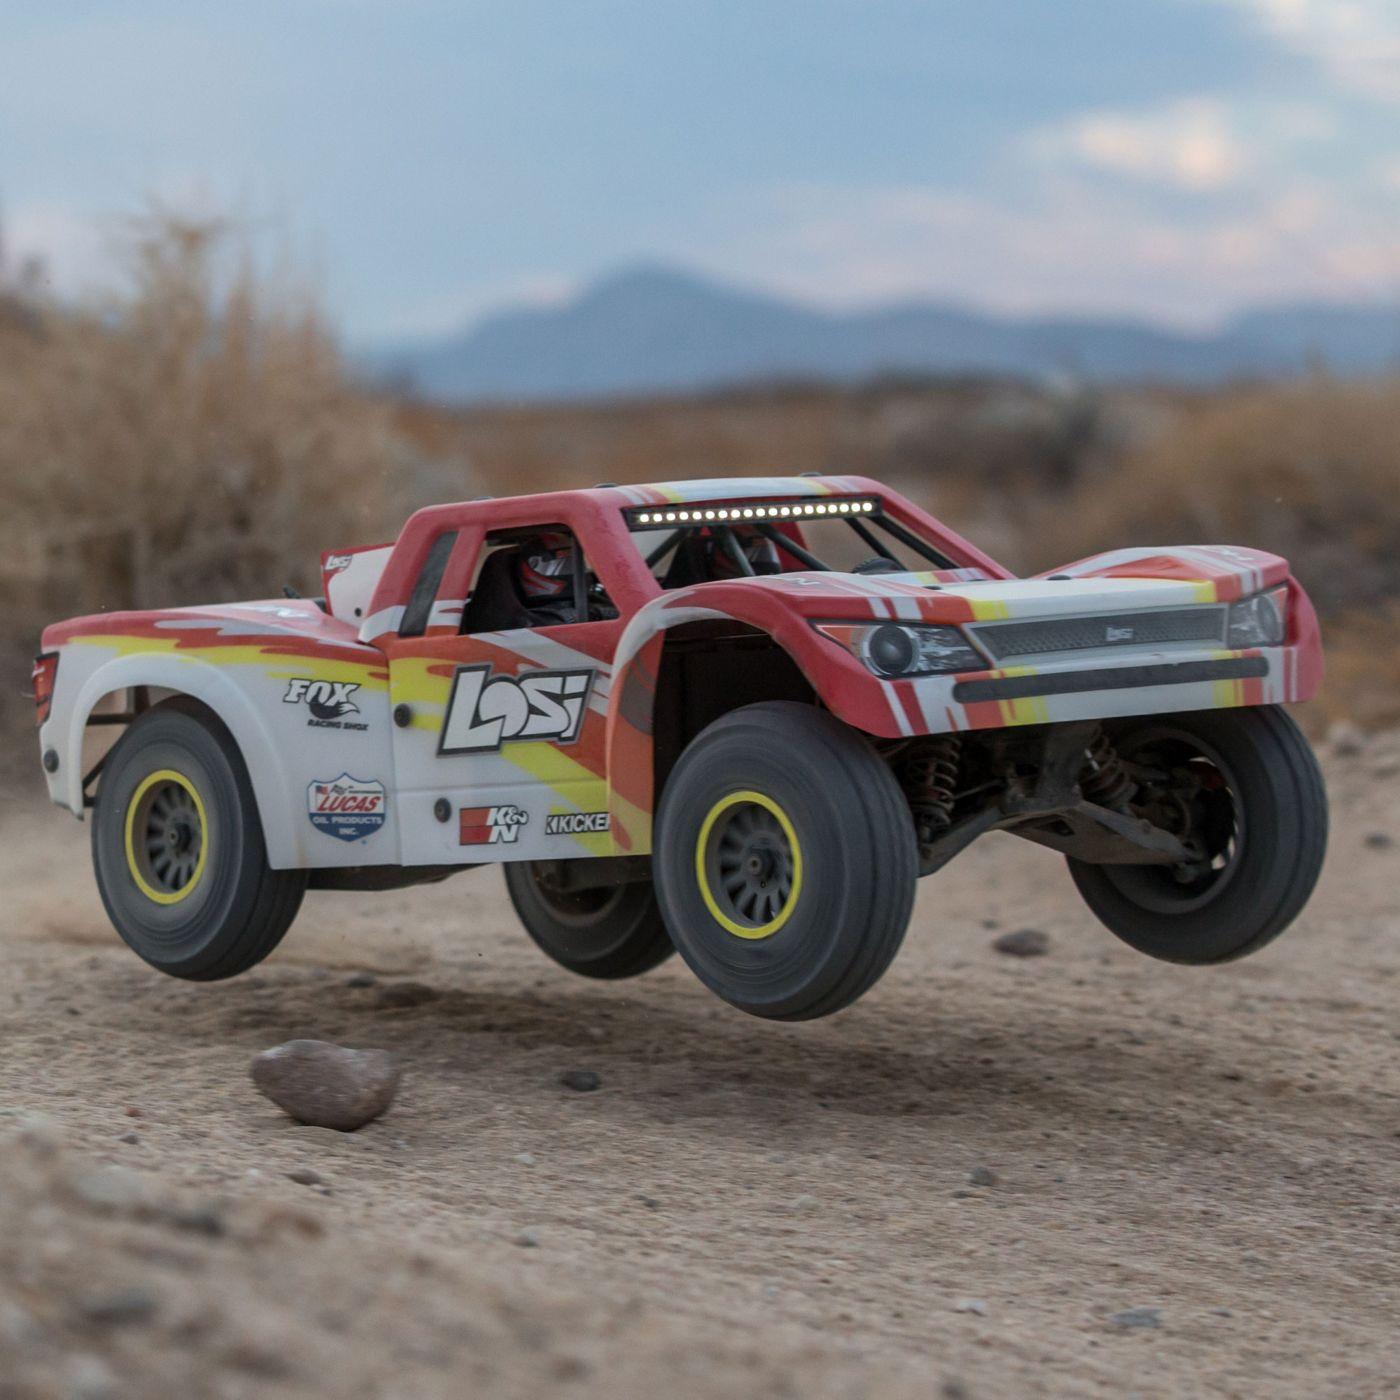 Losi Super Baja Rey Brushless 1/6 4WD Red RTR 3